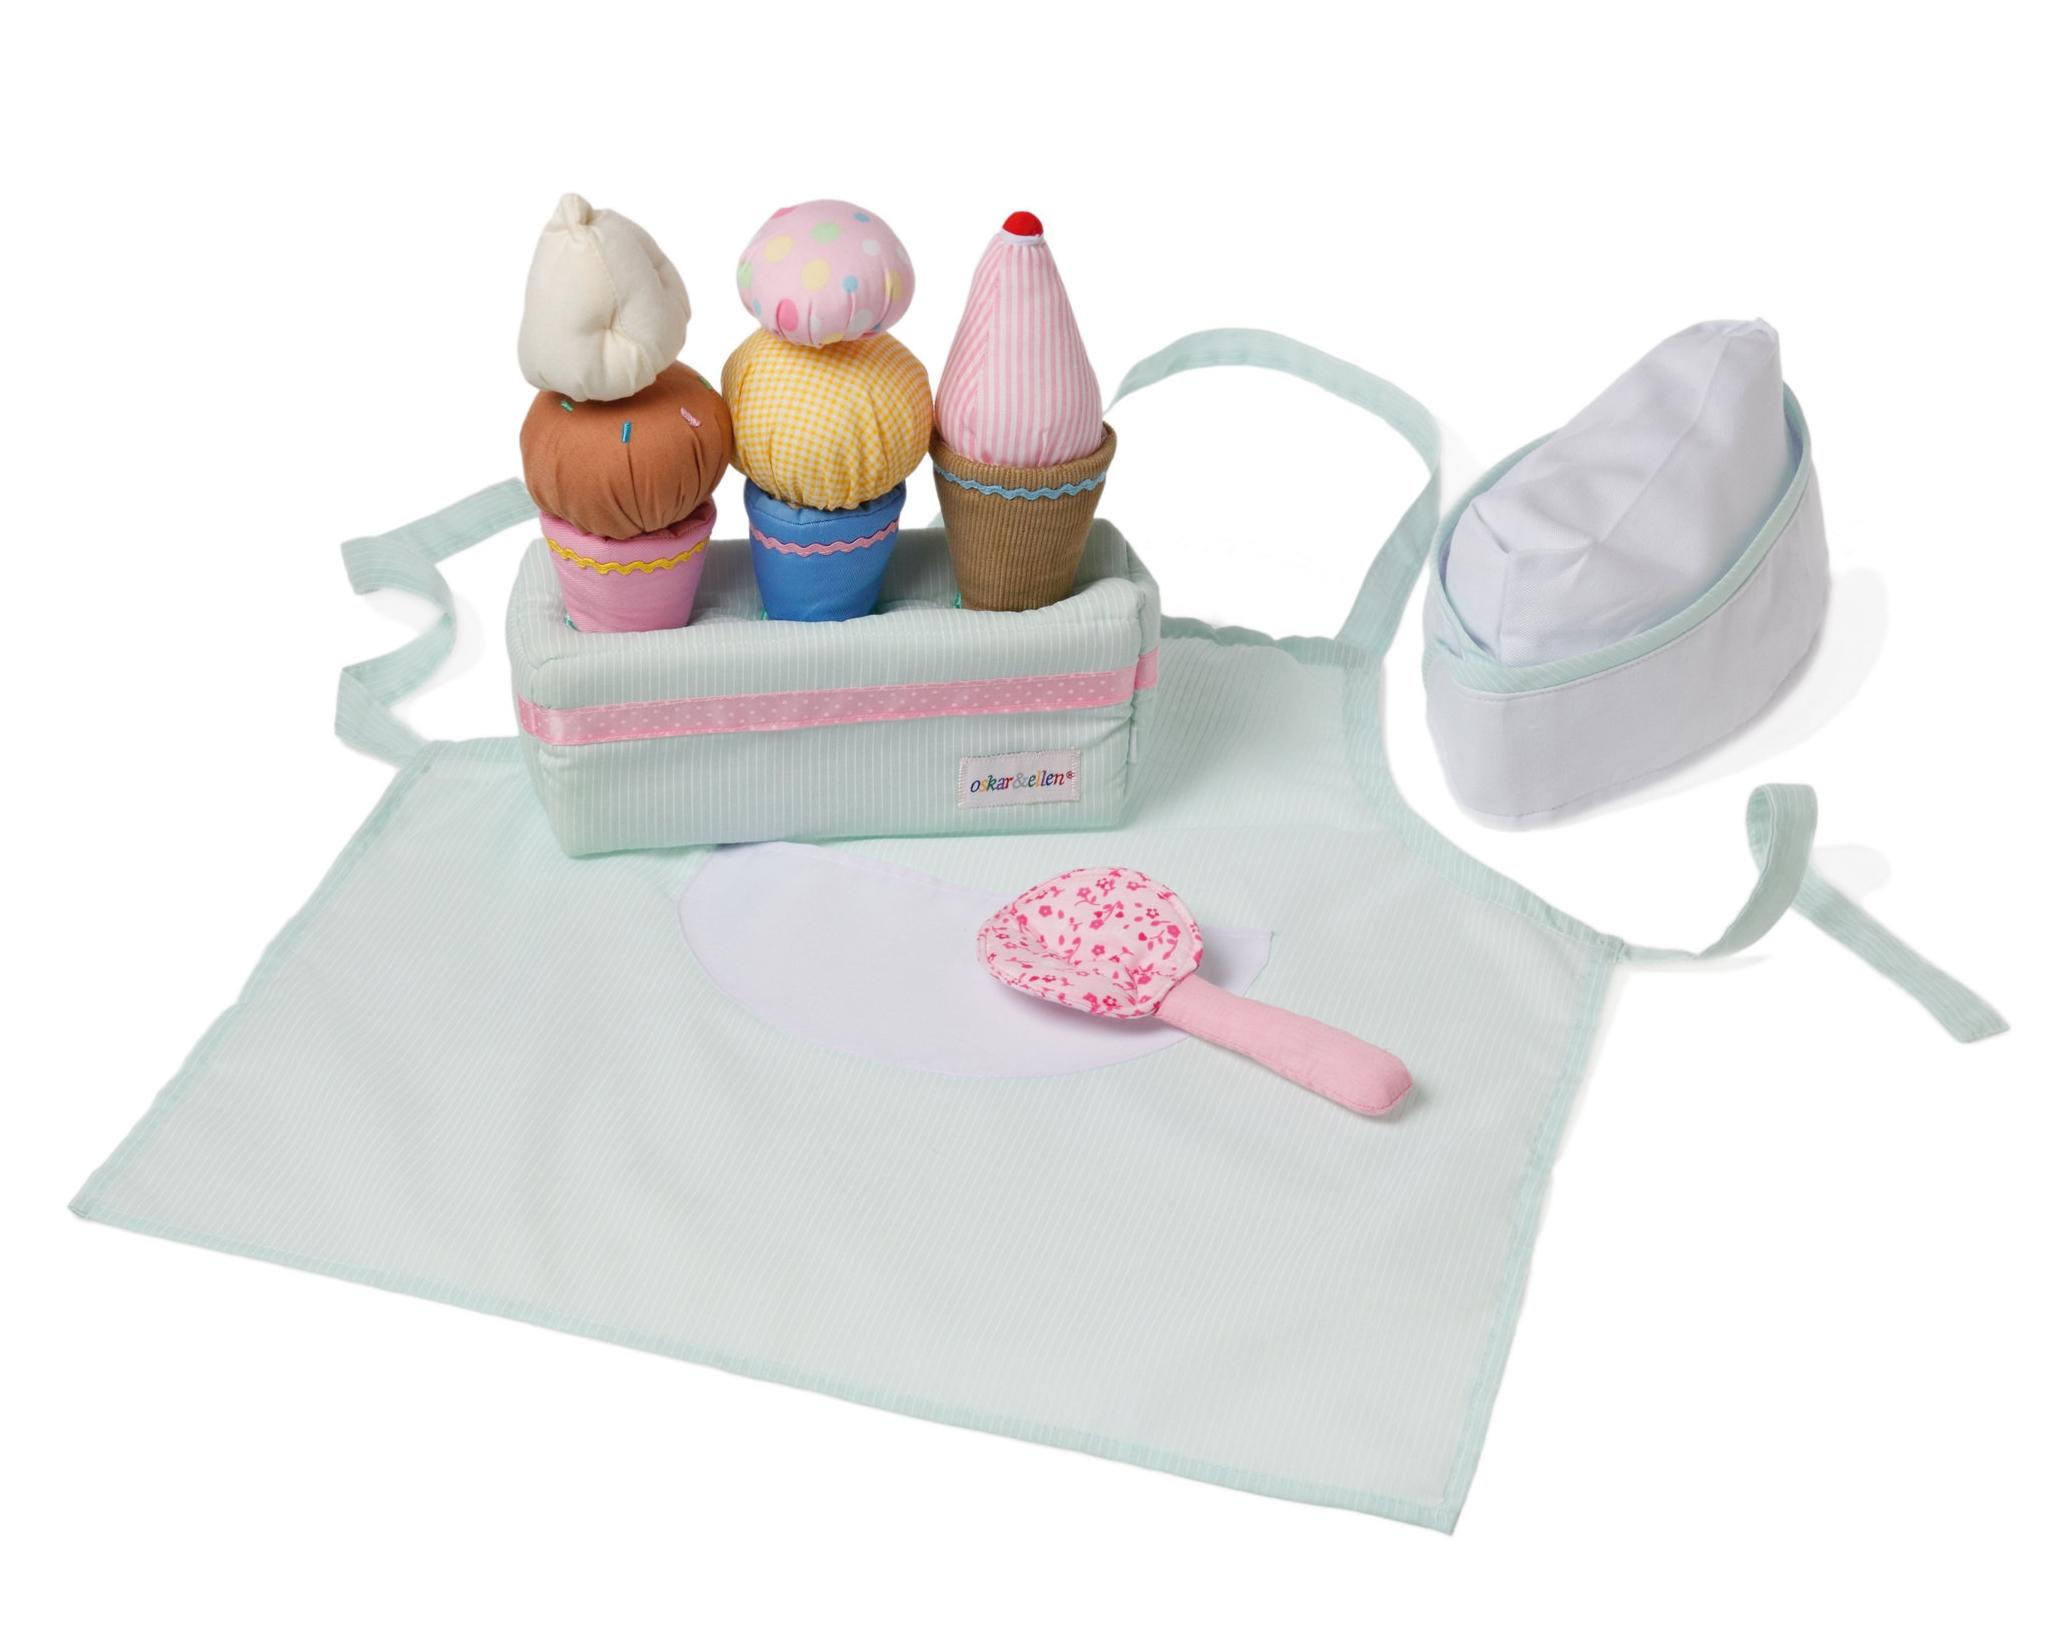 2103 Ice cream set.jpg